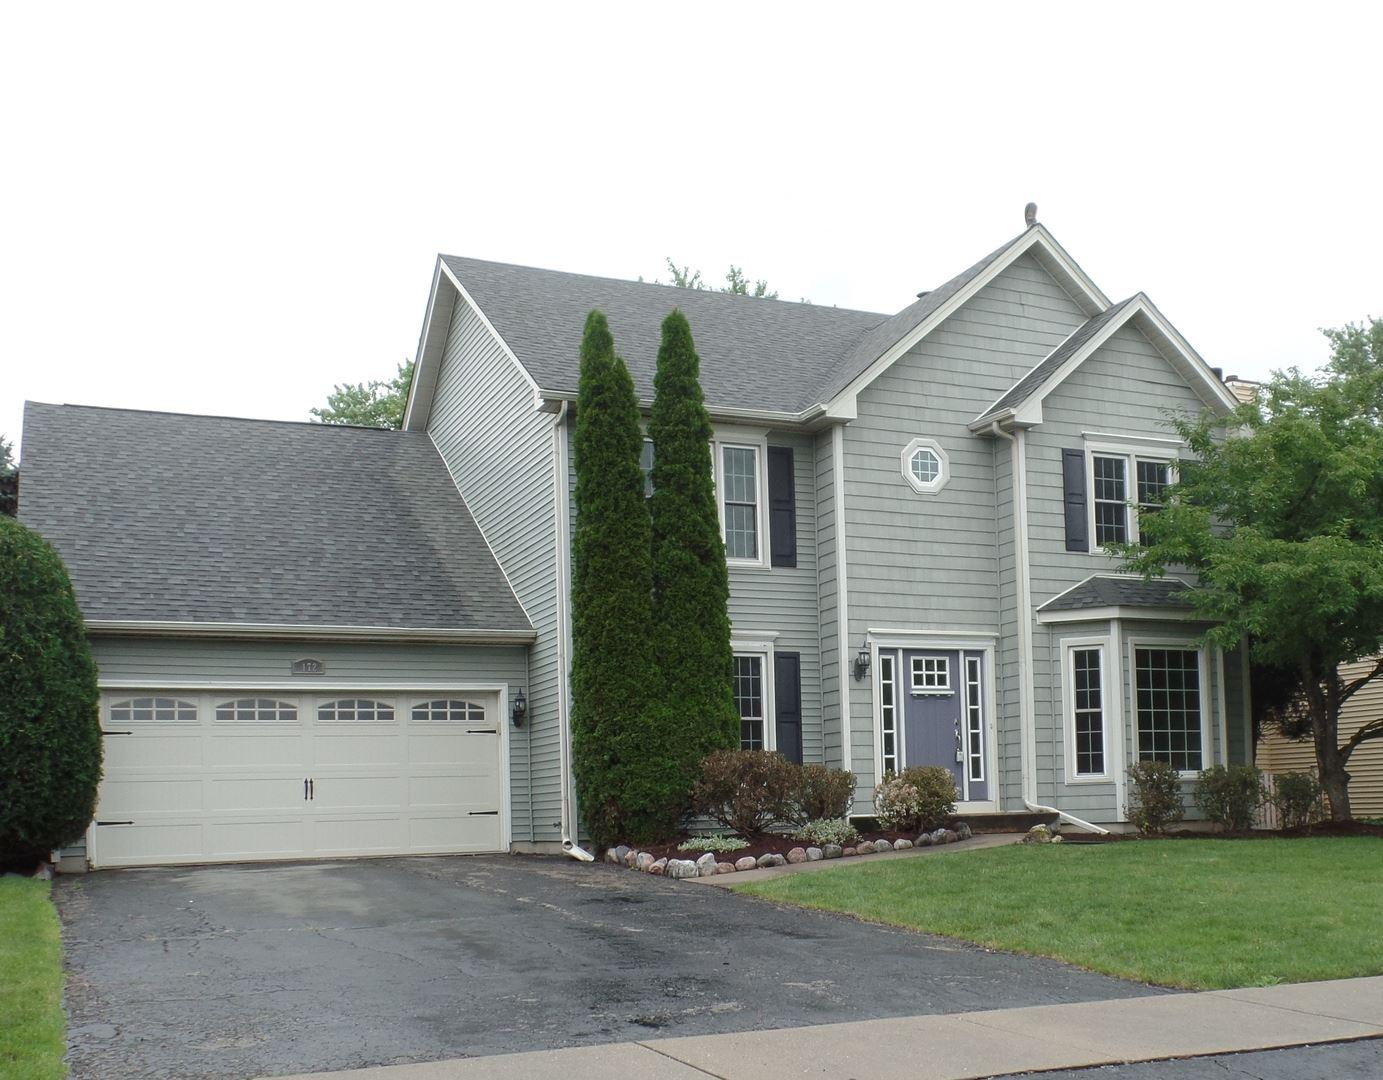 Photo of 172 N Vincent Drive, Bolingbrook, IL 60490 (MLS # 11158261)